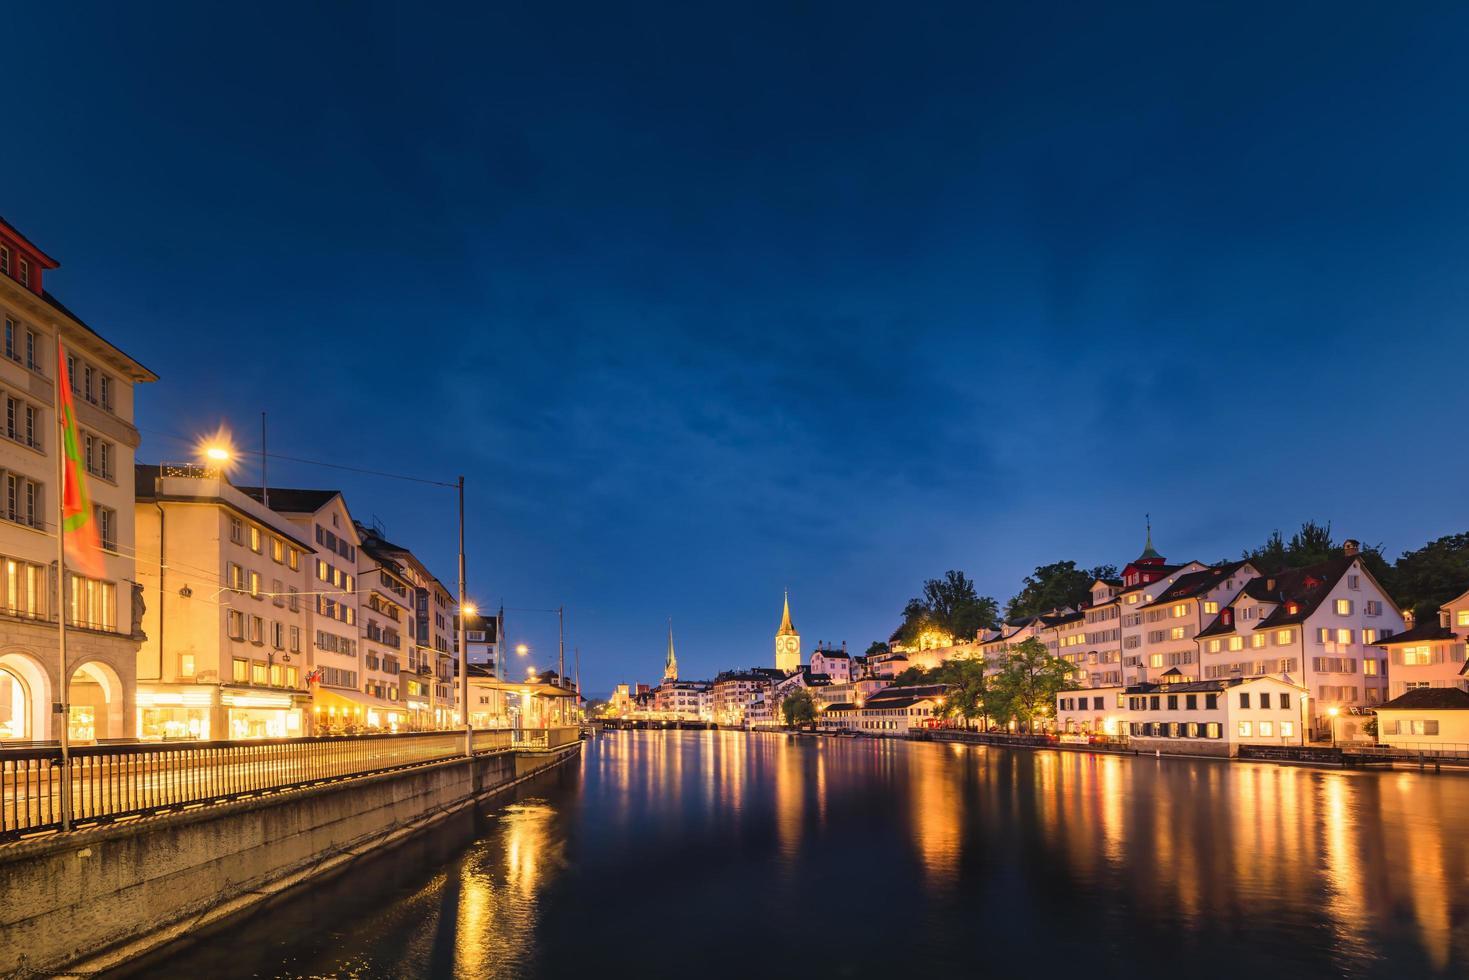 paysage urbain de zurich, suisse photo